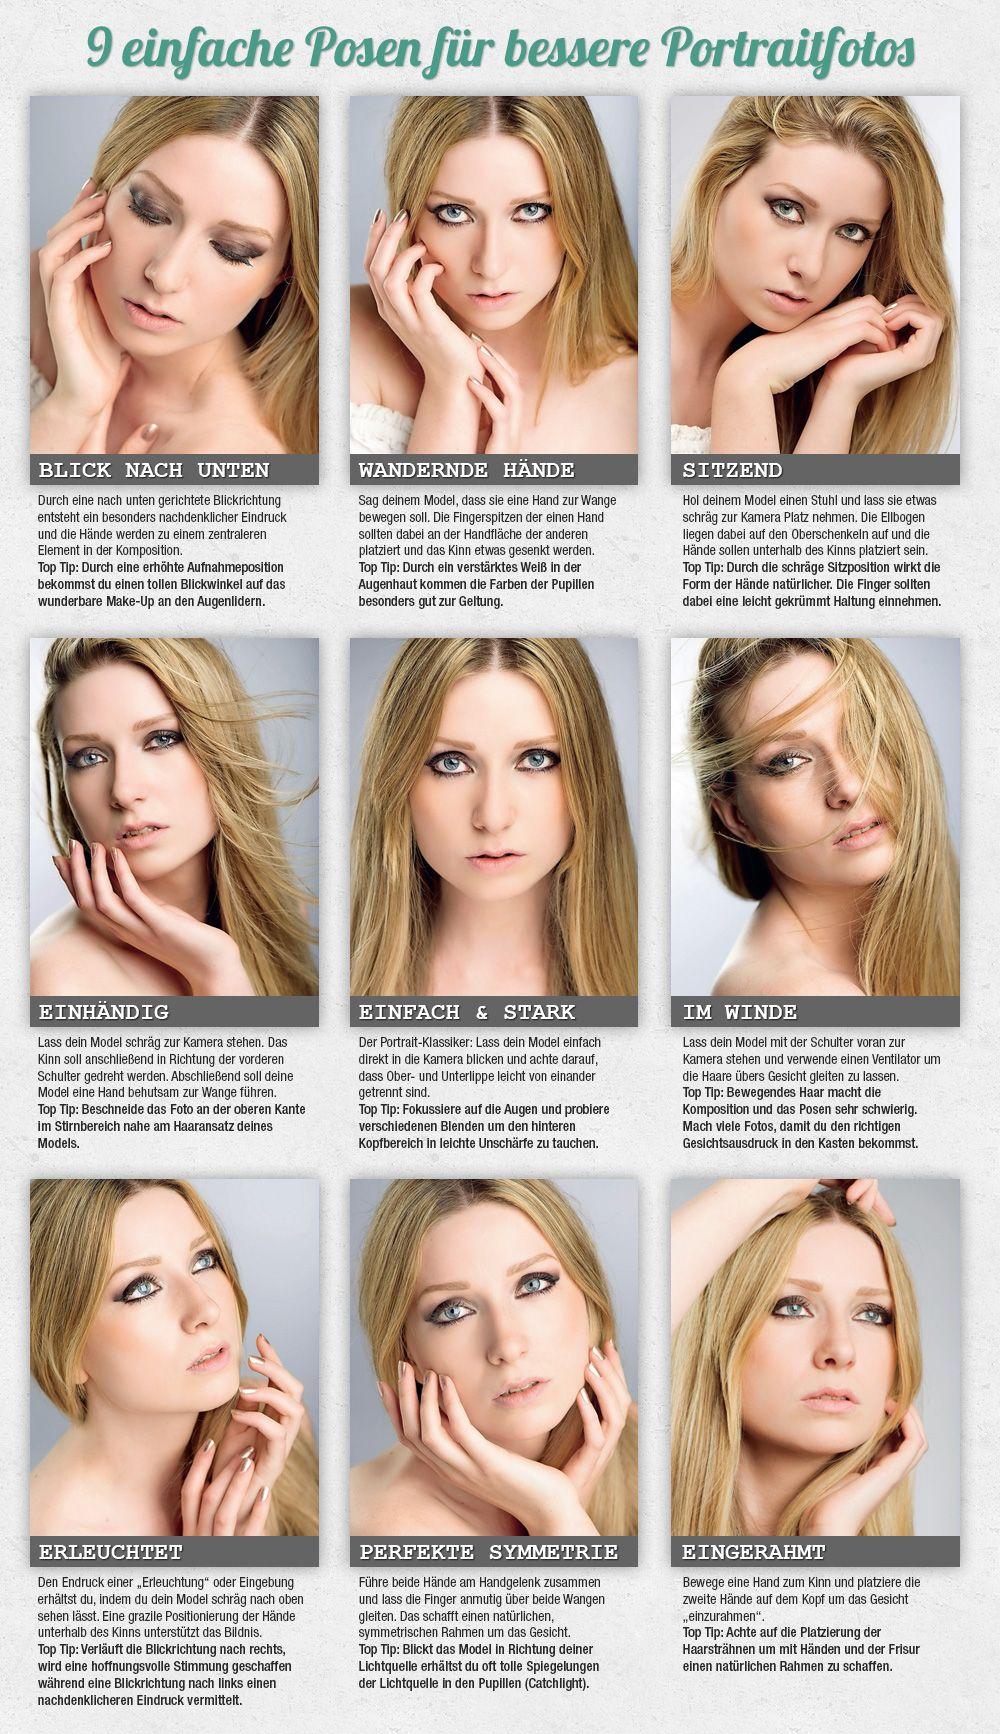 Infografik: 9 Posen die man als Portraitfotograf kennen muss | poses ...